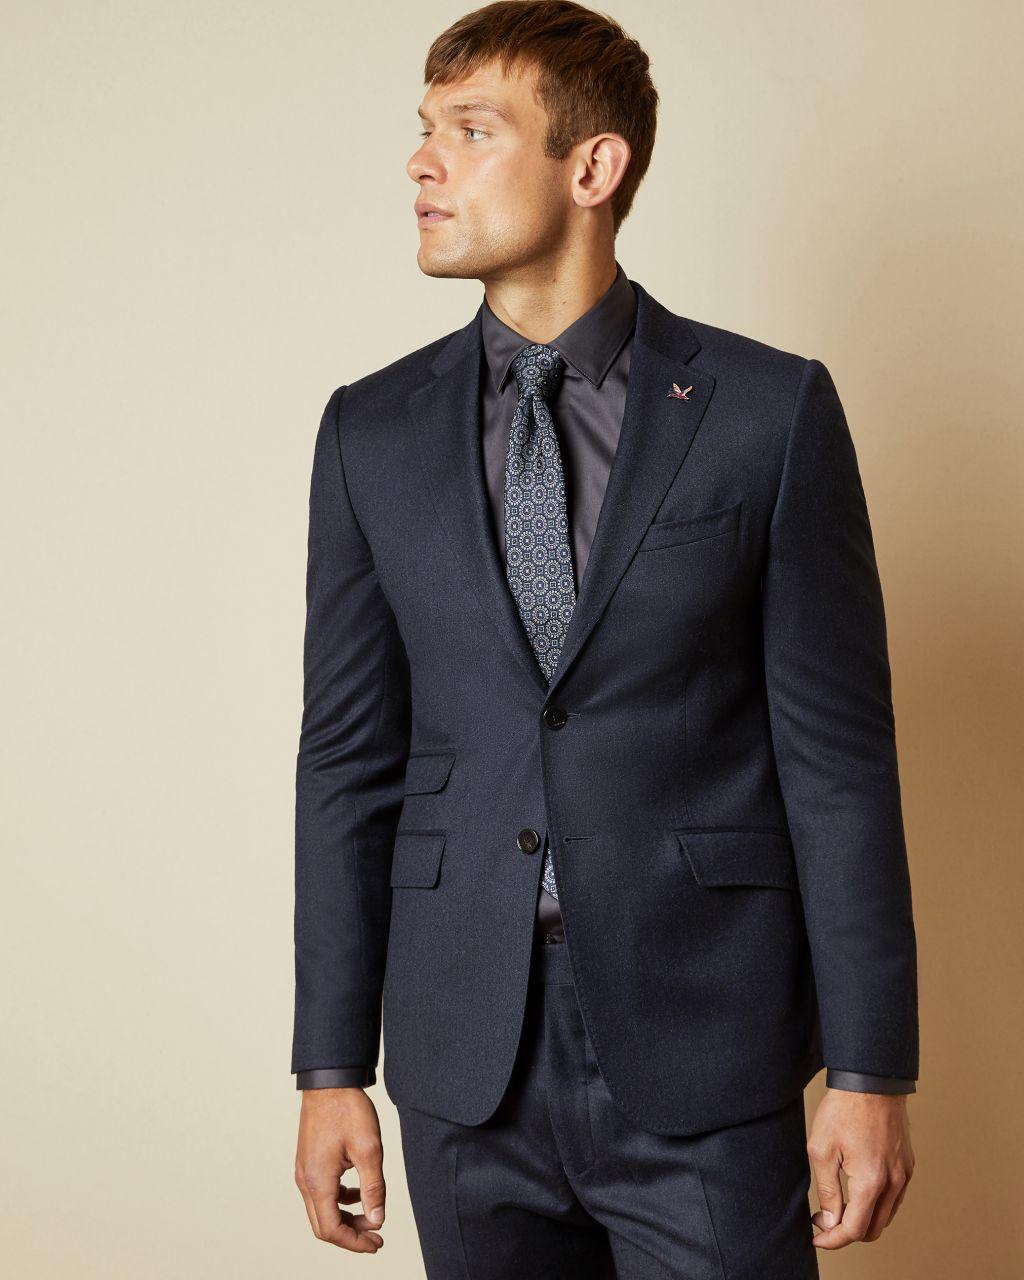 TED BAKER Sterling Wool Jacket | TED BAKER SALE